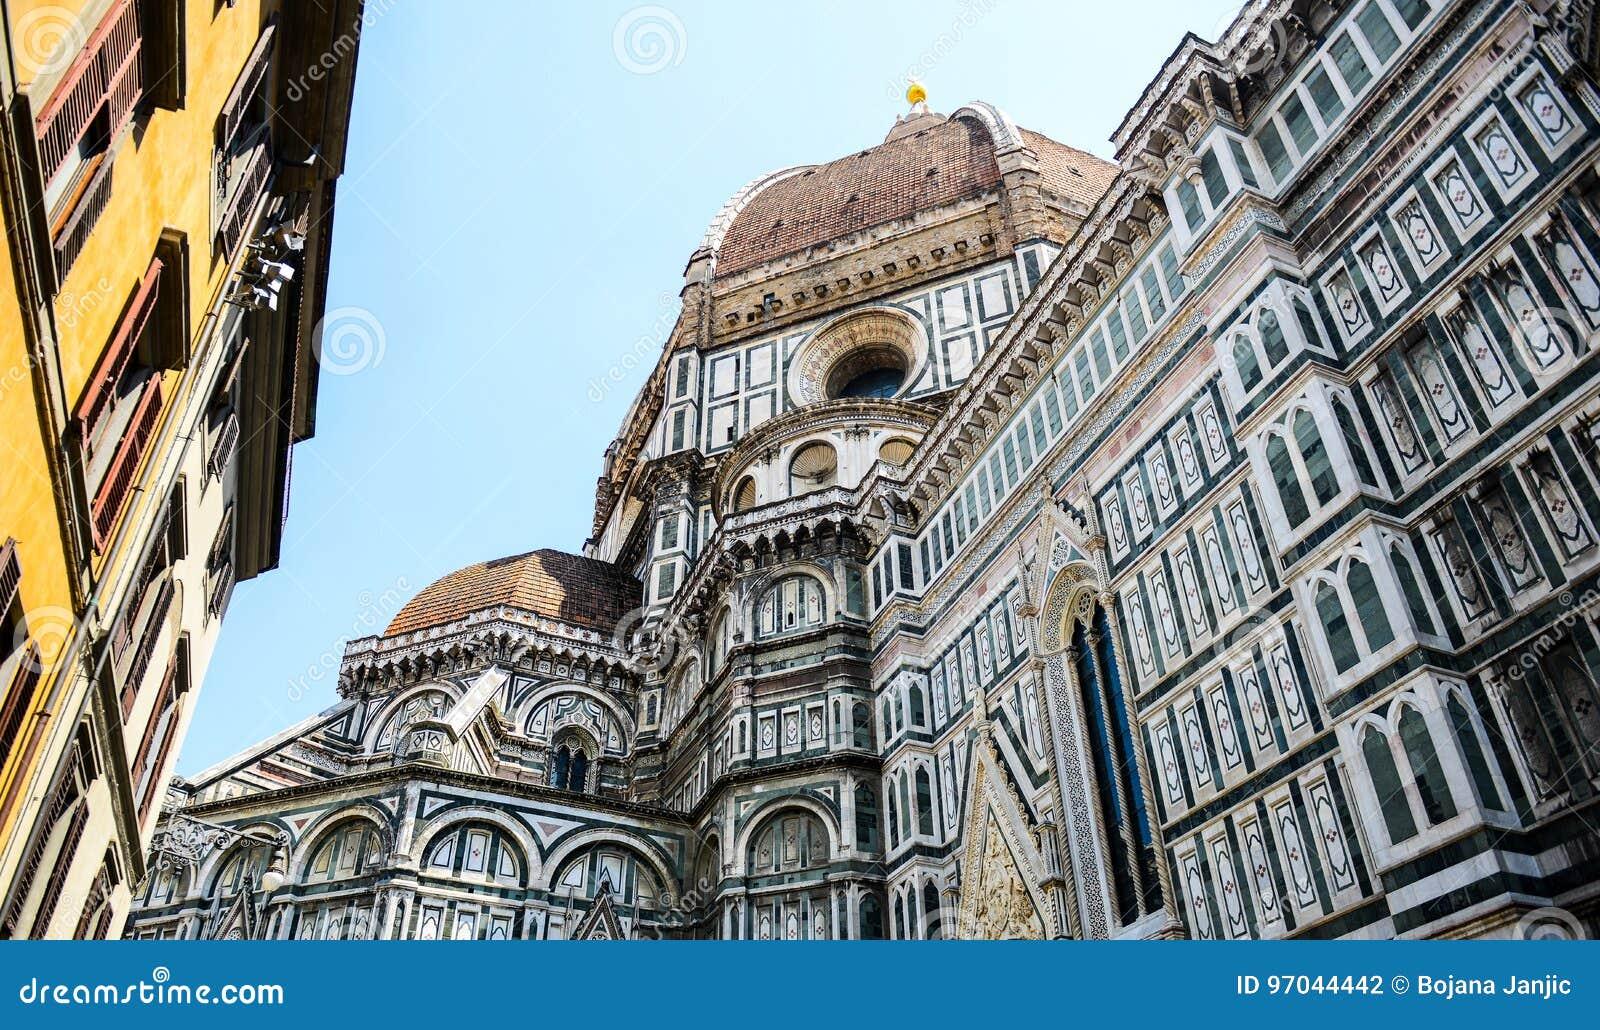 Basilica del fiore佛罗伦萨玛丽亚・圣诞老人